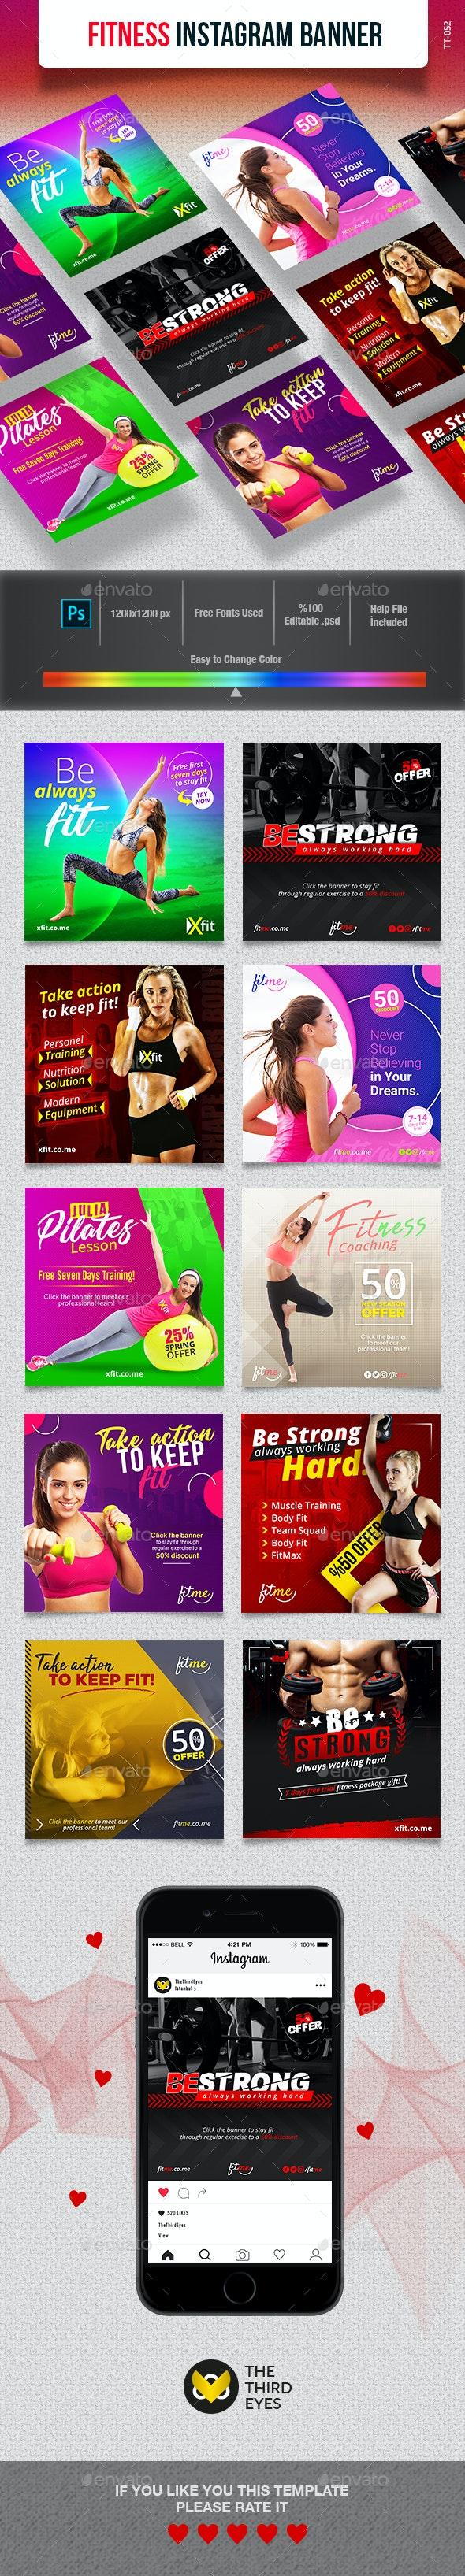 Fitness Instagram Banner - Social Media Web Elements